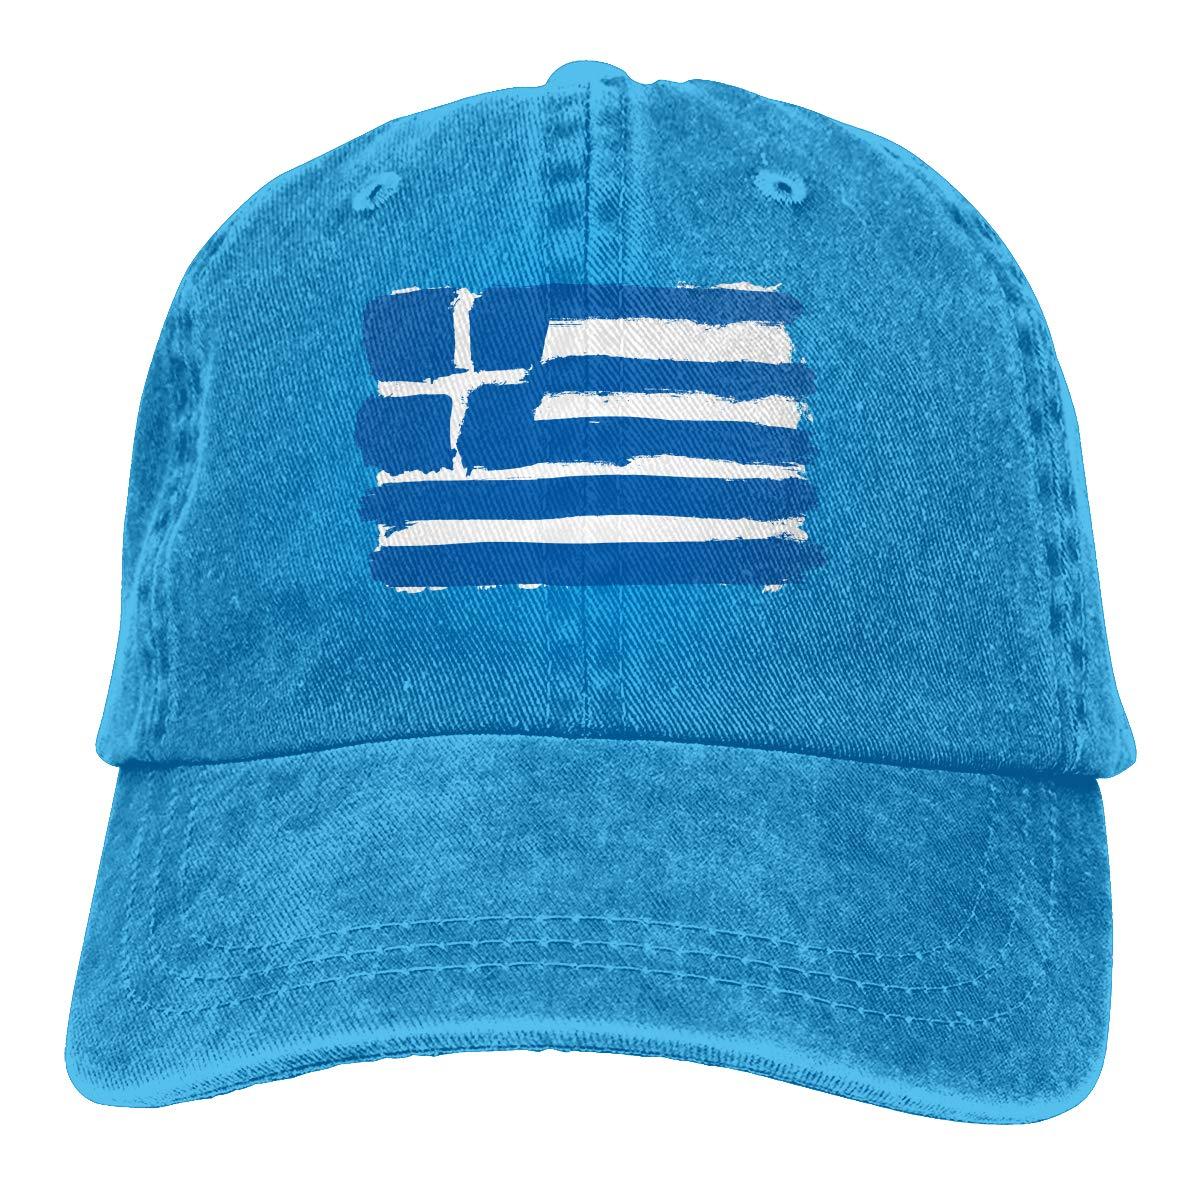 NCEUANCE Greece Greek Flag Caps Sports Trucker Caps Pattern Strapback Hat for Men//Women